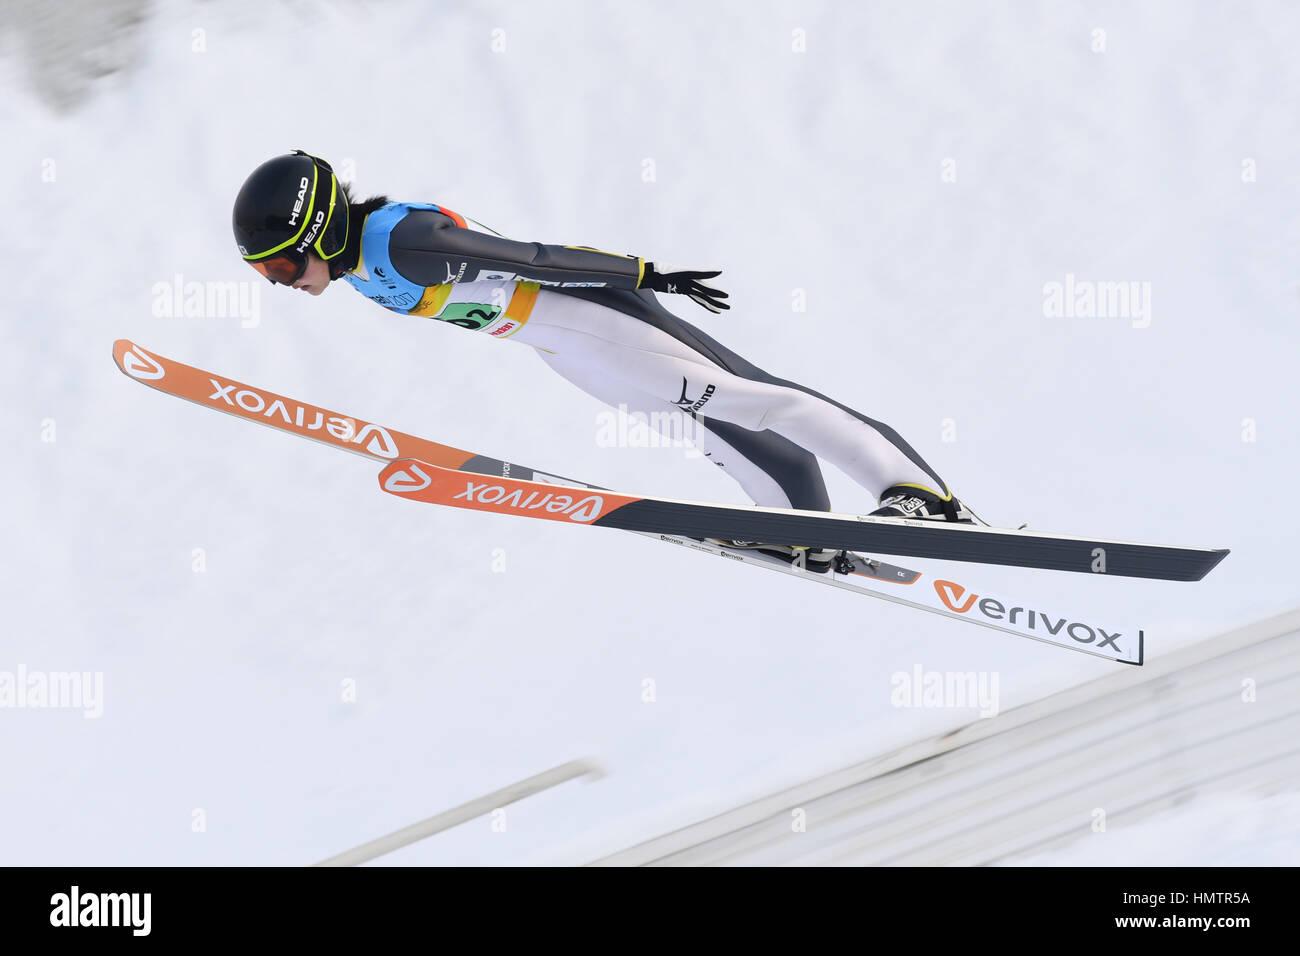 Almaty, Kasachstan. 5. Februar 2017. Haruka Iwasa (JPN) auf den 28. Winter-Universiade Almaty 2017 Frauen Nationalmannschaft Stockfoto